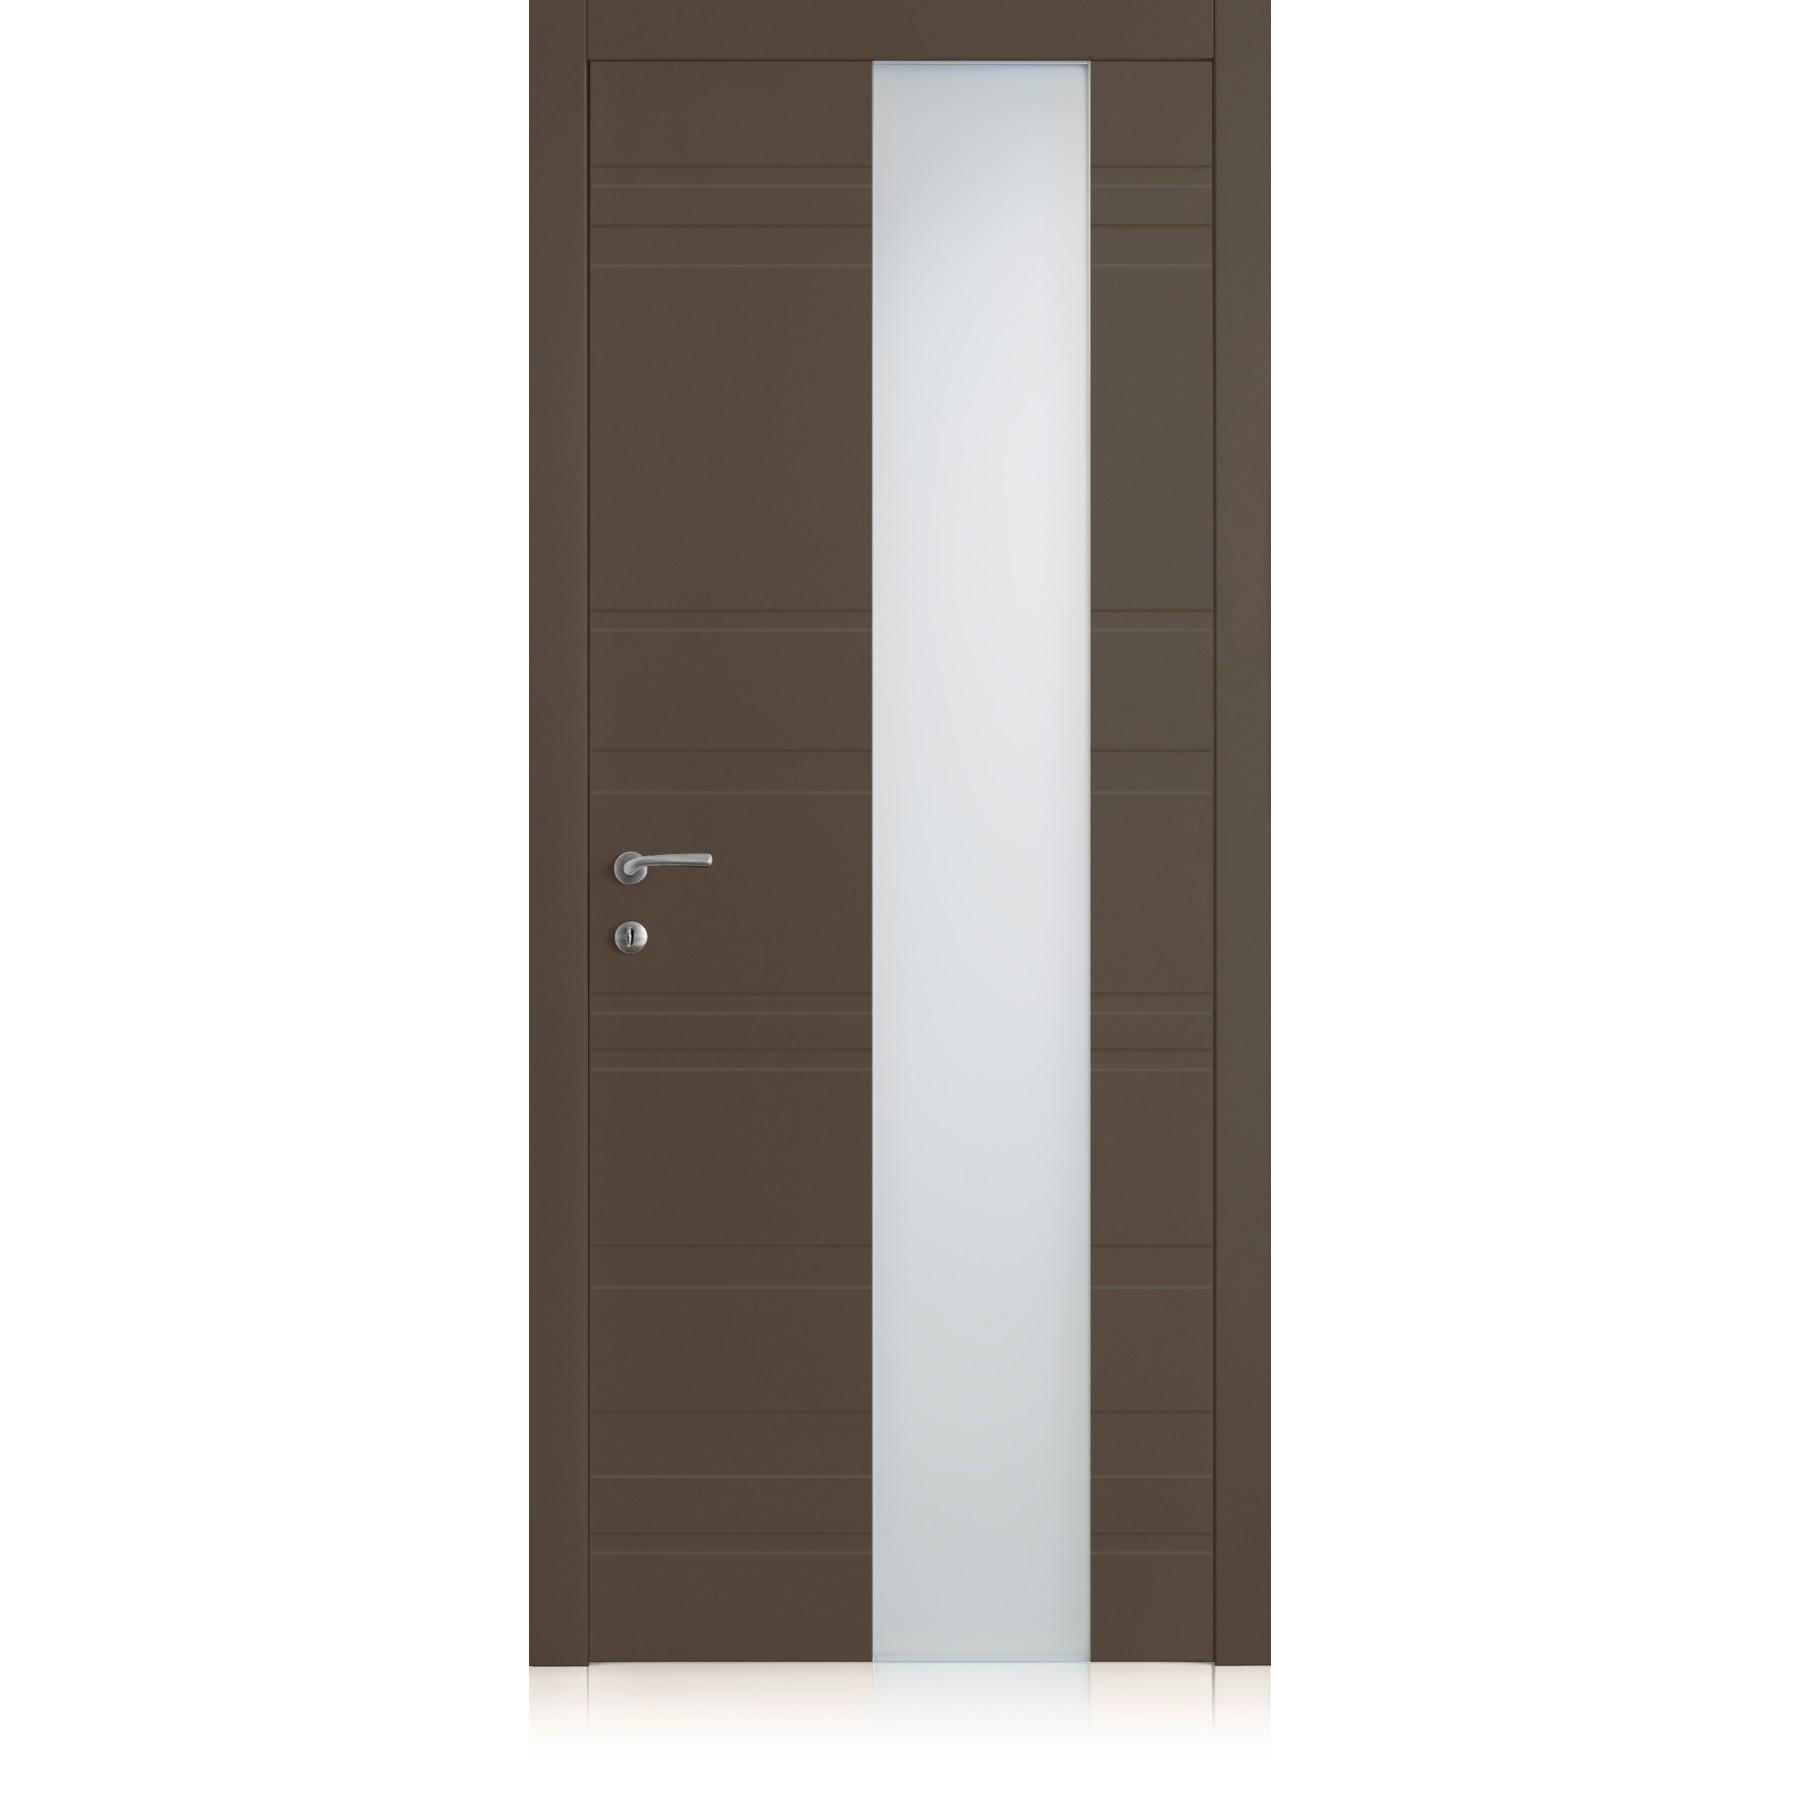 Yncisa Styla Vetro Ombra Dark Laccato ULTRAopaco door